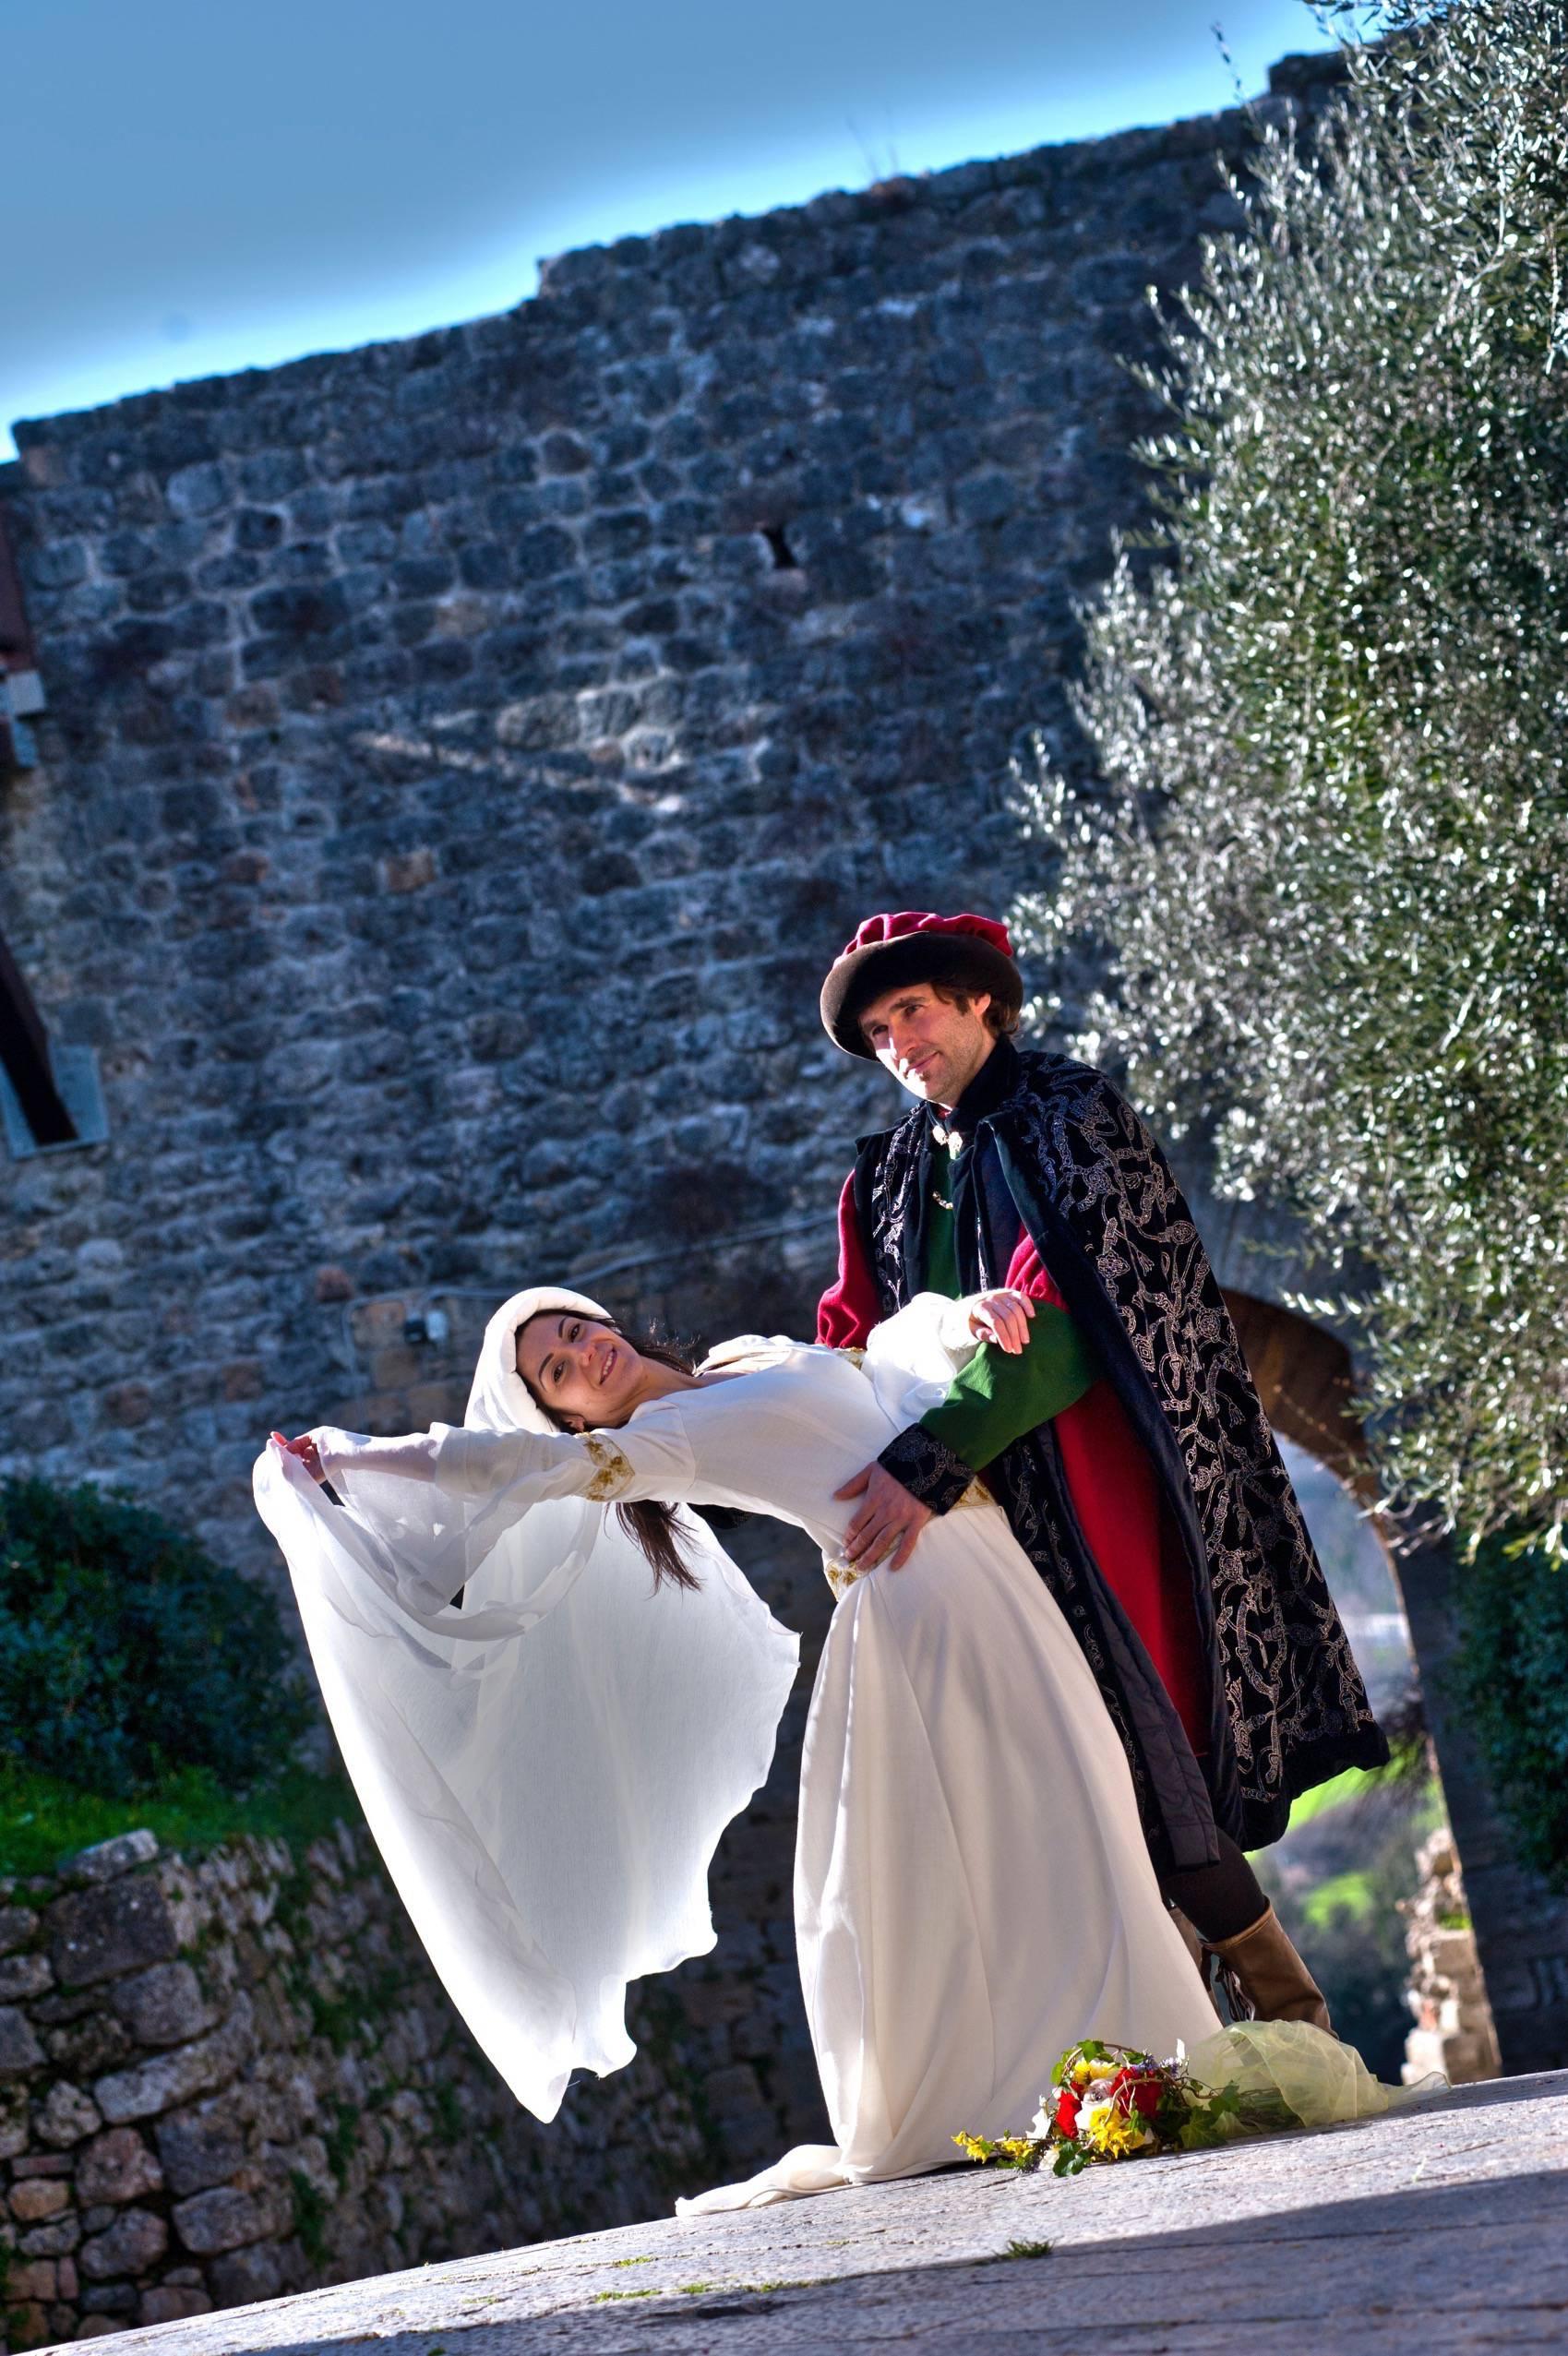 medieval wedding ceremony - HD1699×2553